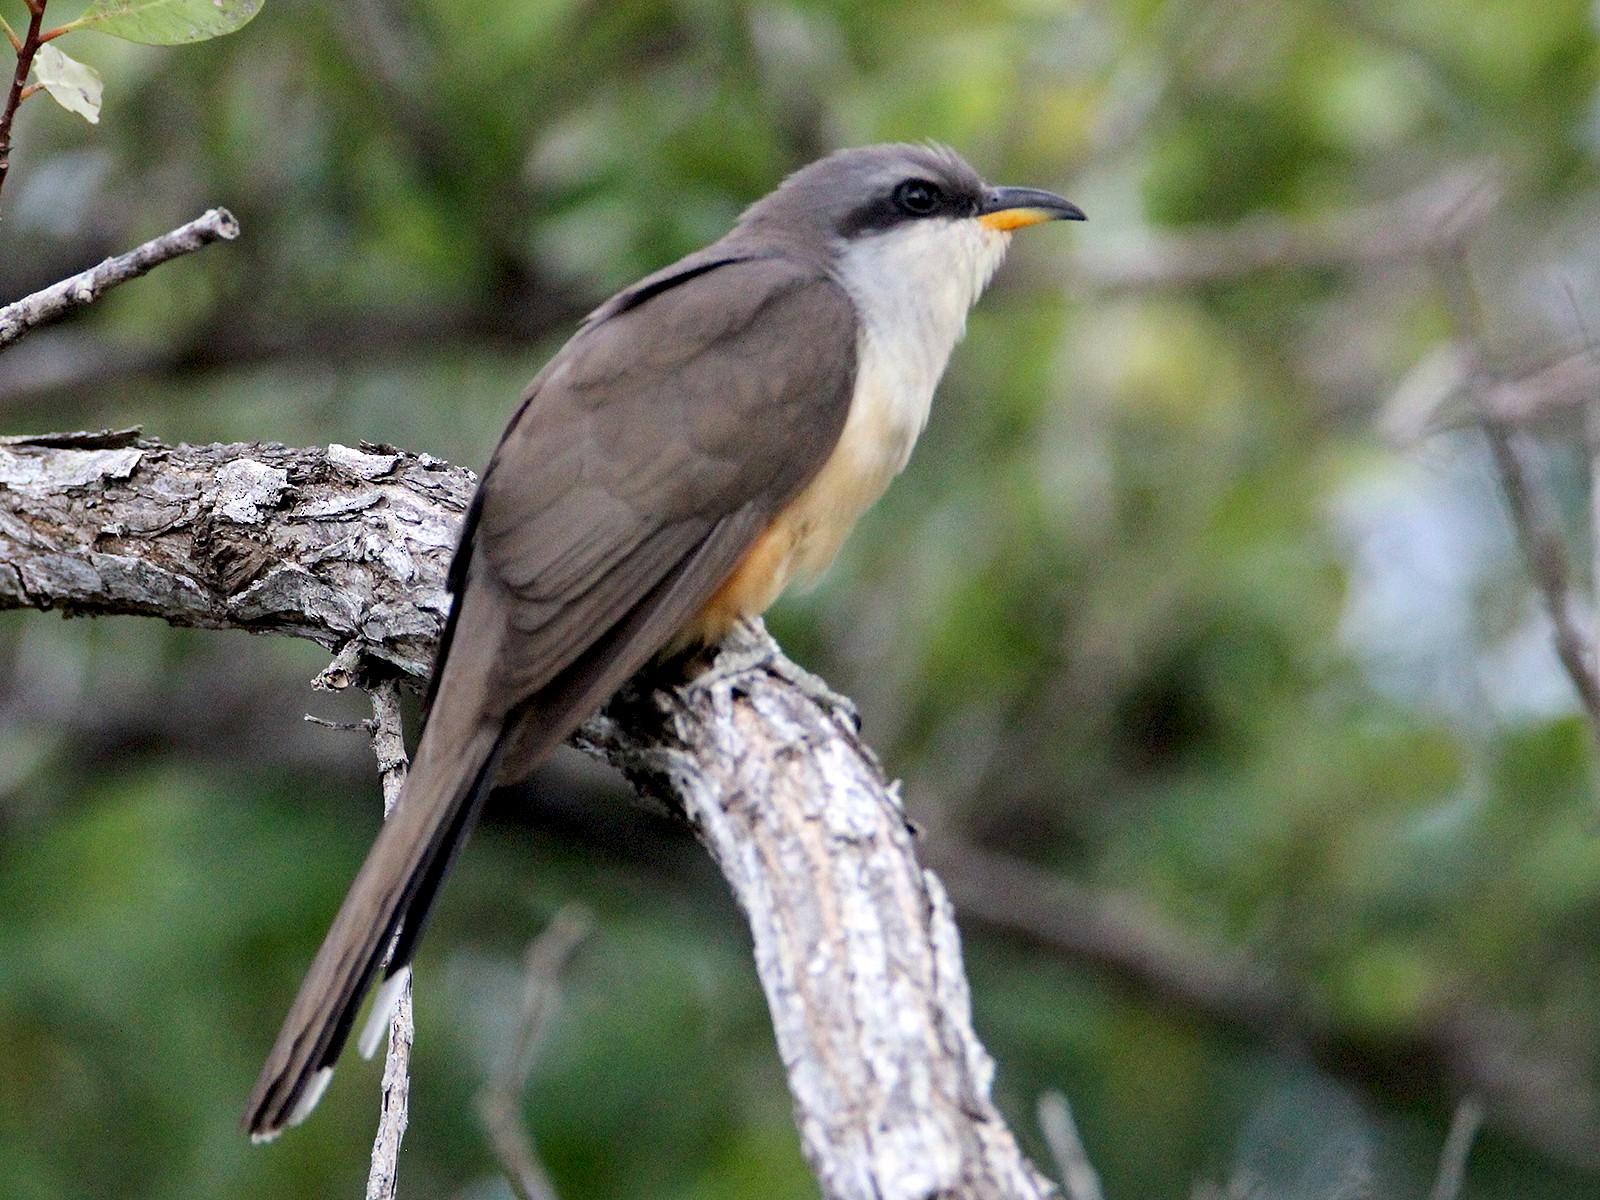 Mangrove Cuckoo - Jim de Waal Malefyt